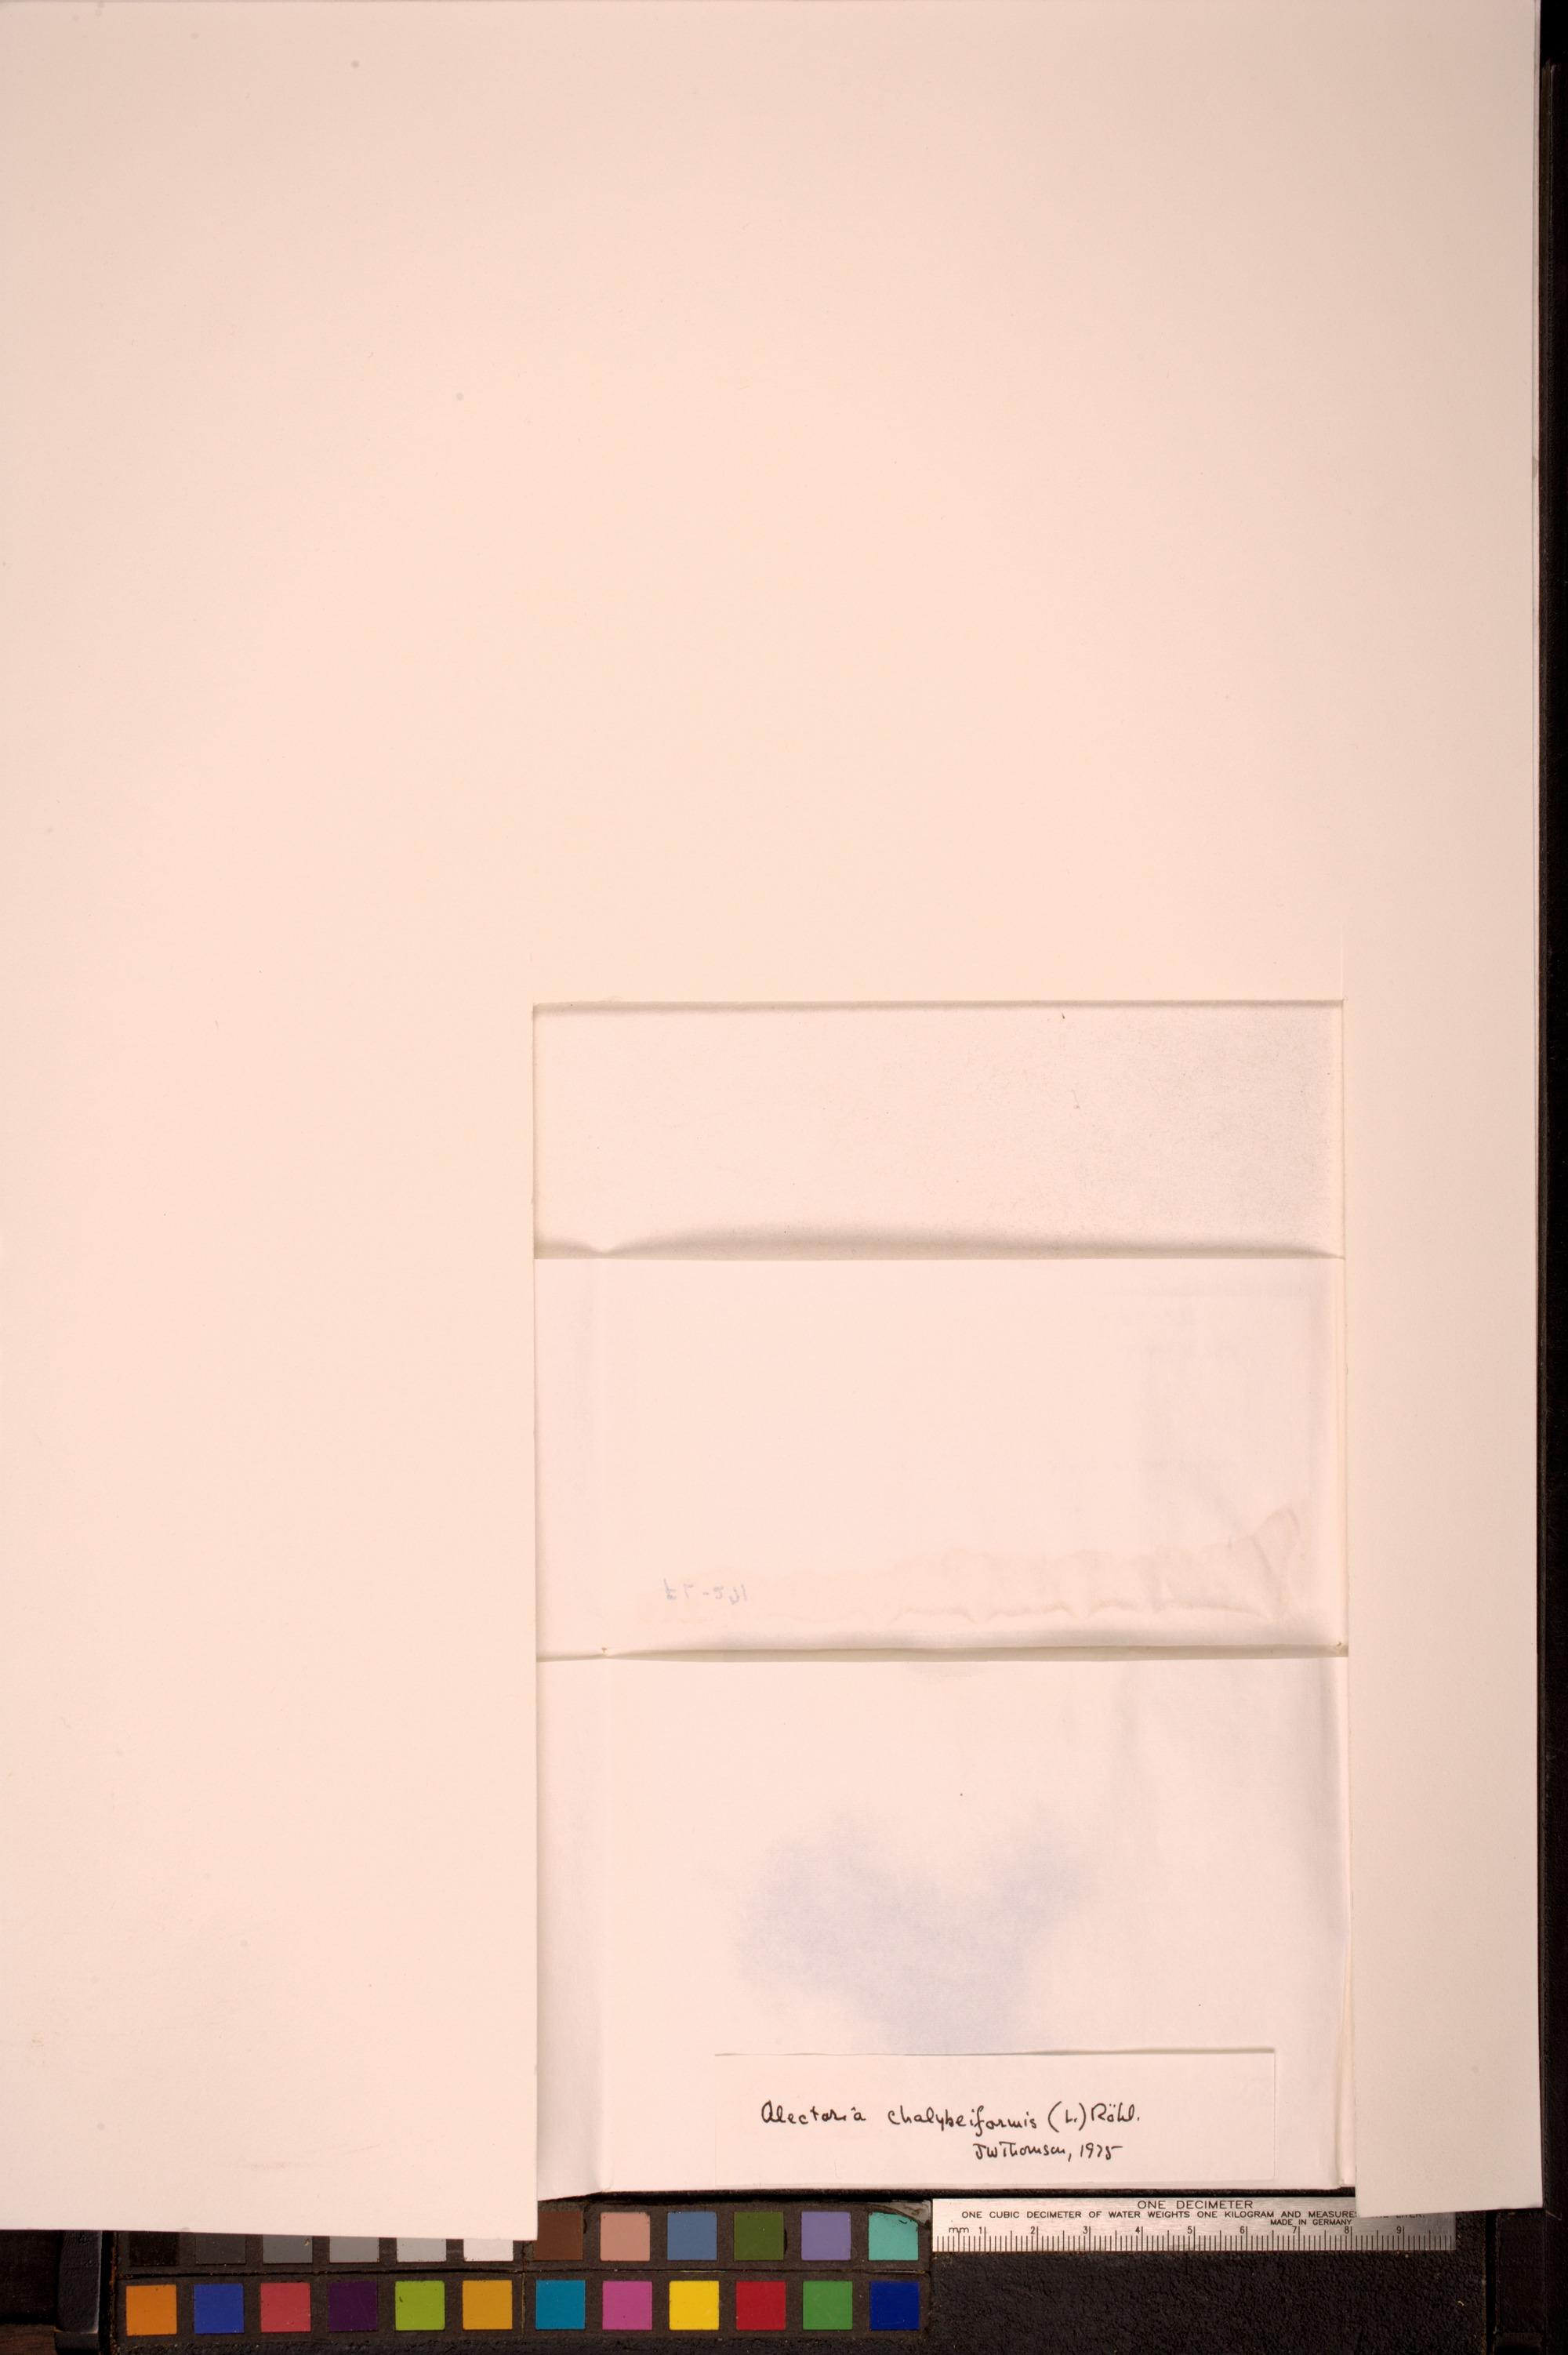 Nodobryoria subdivergens image